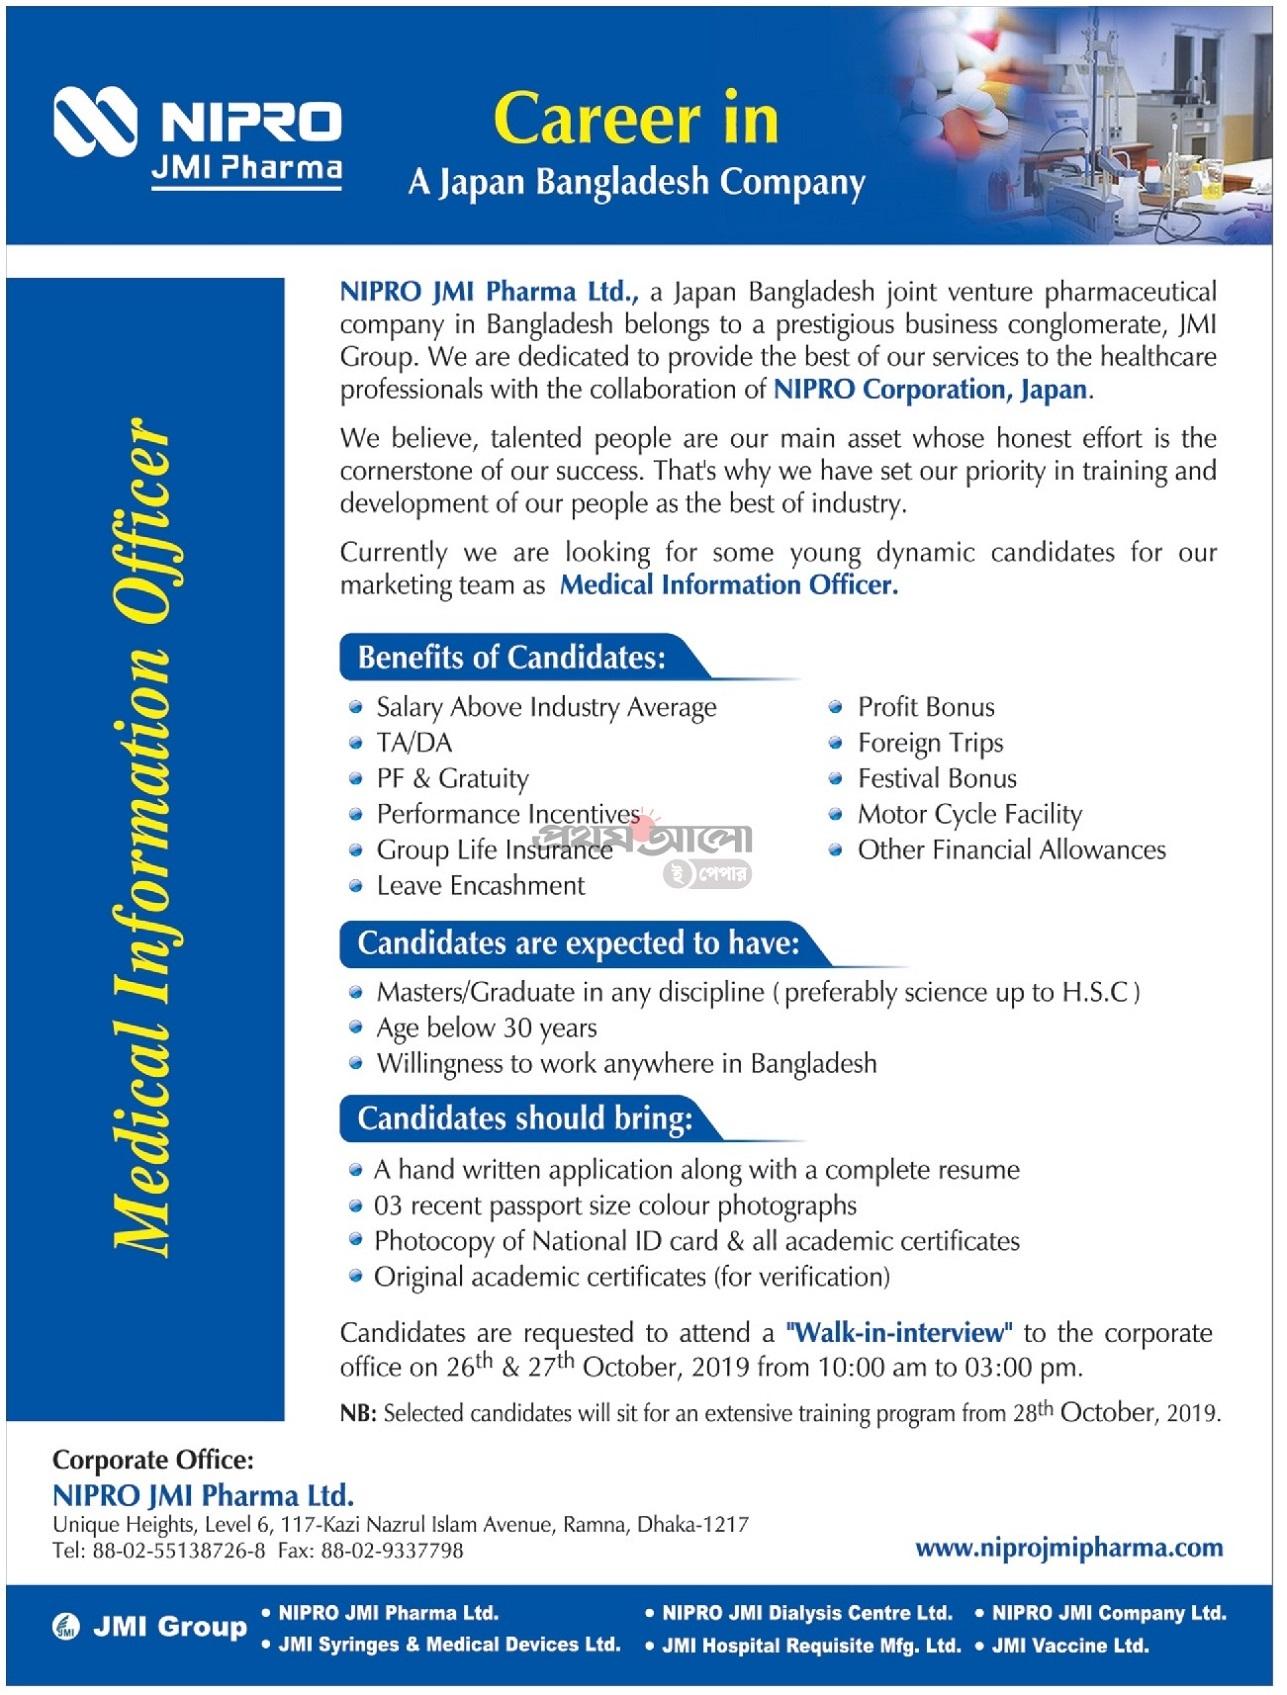 NIPRO JMI Pharma Job Circular 2019